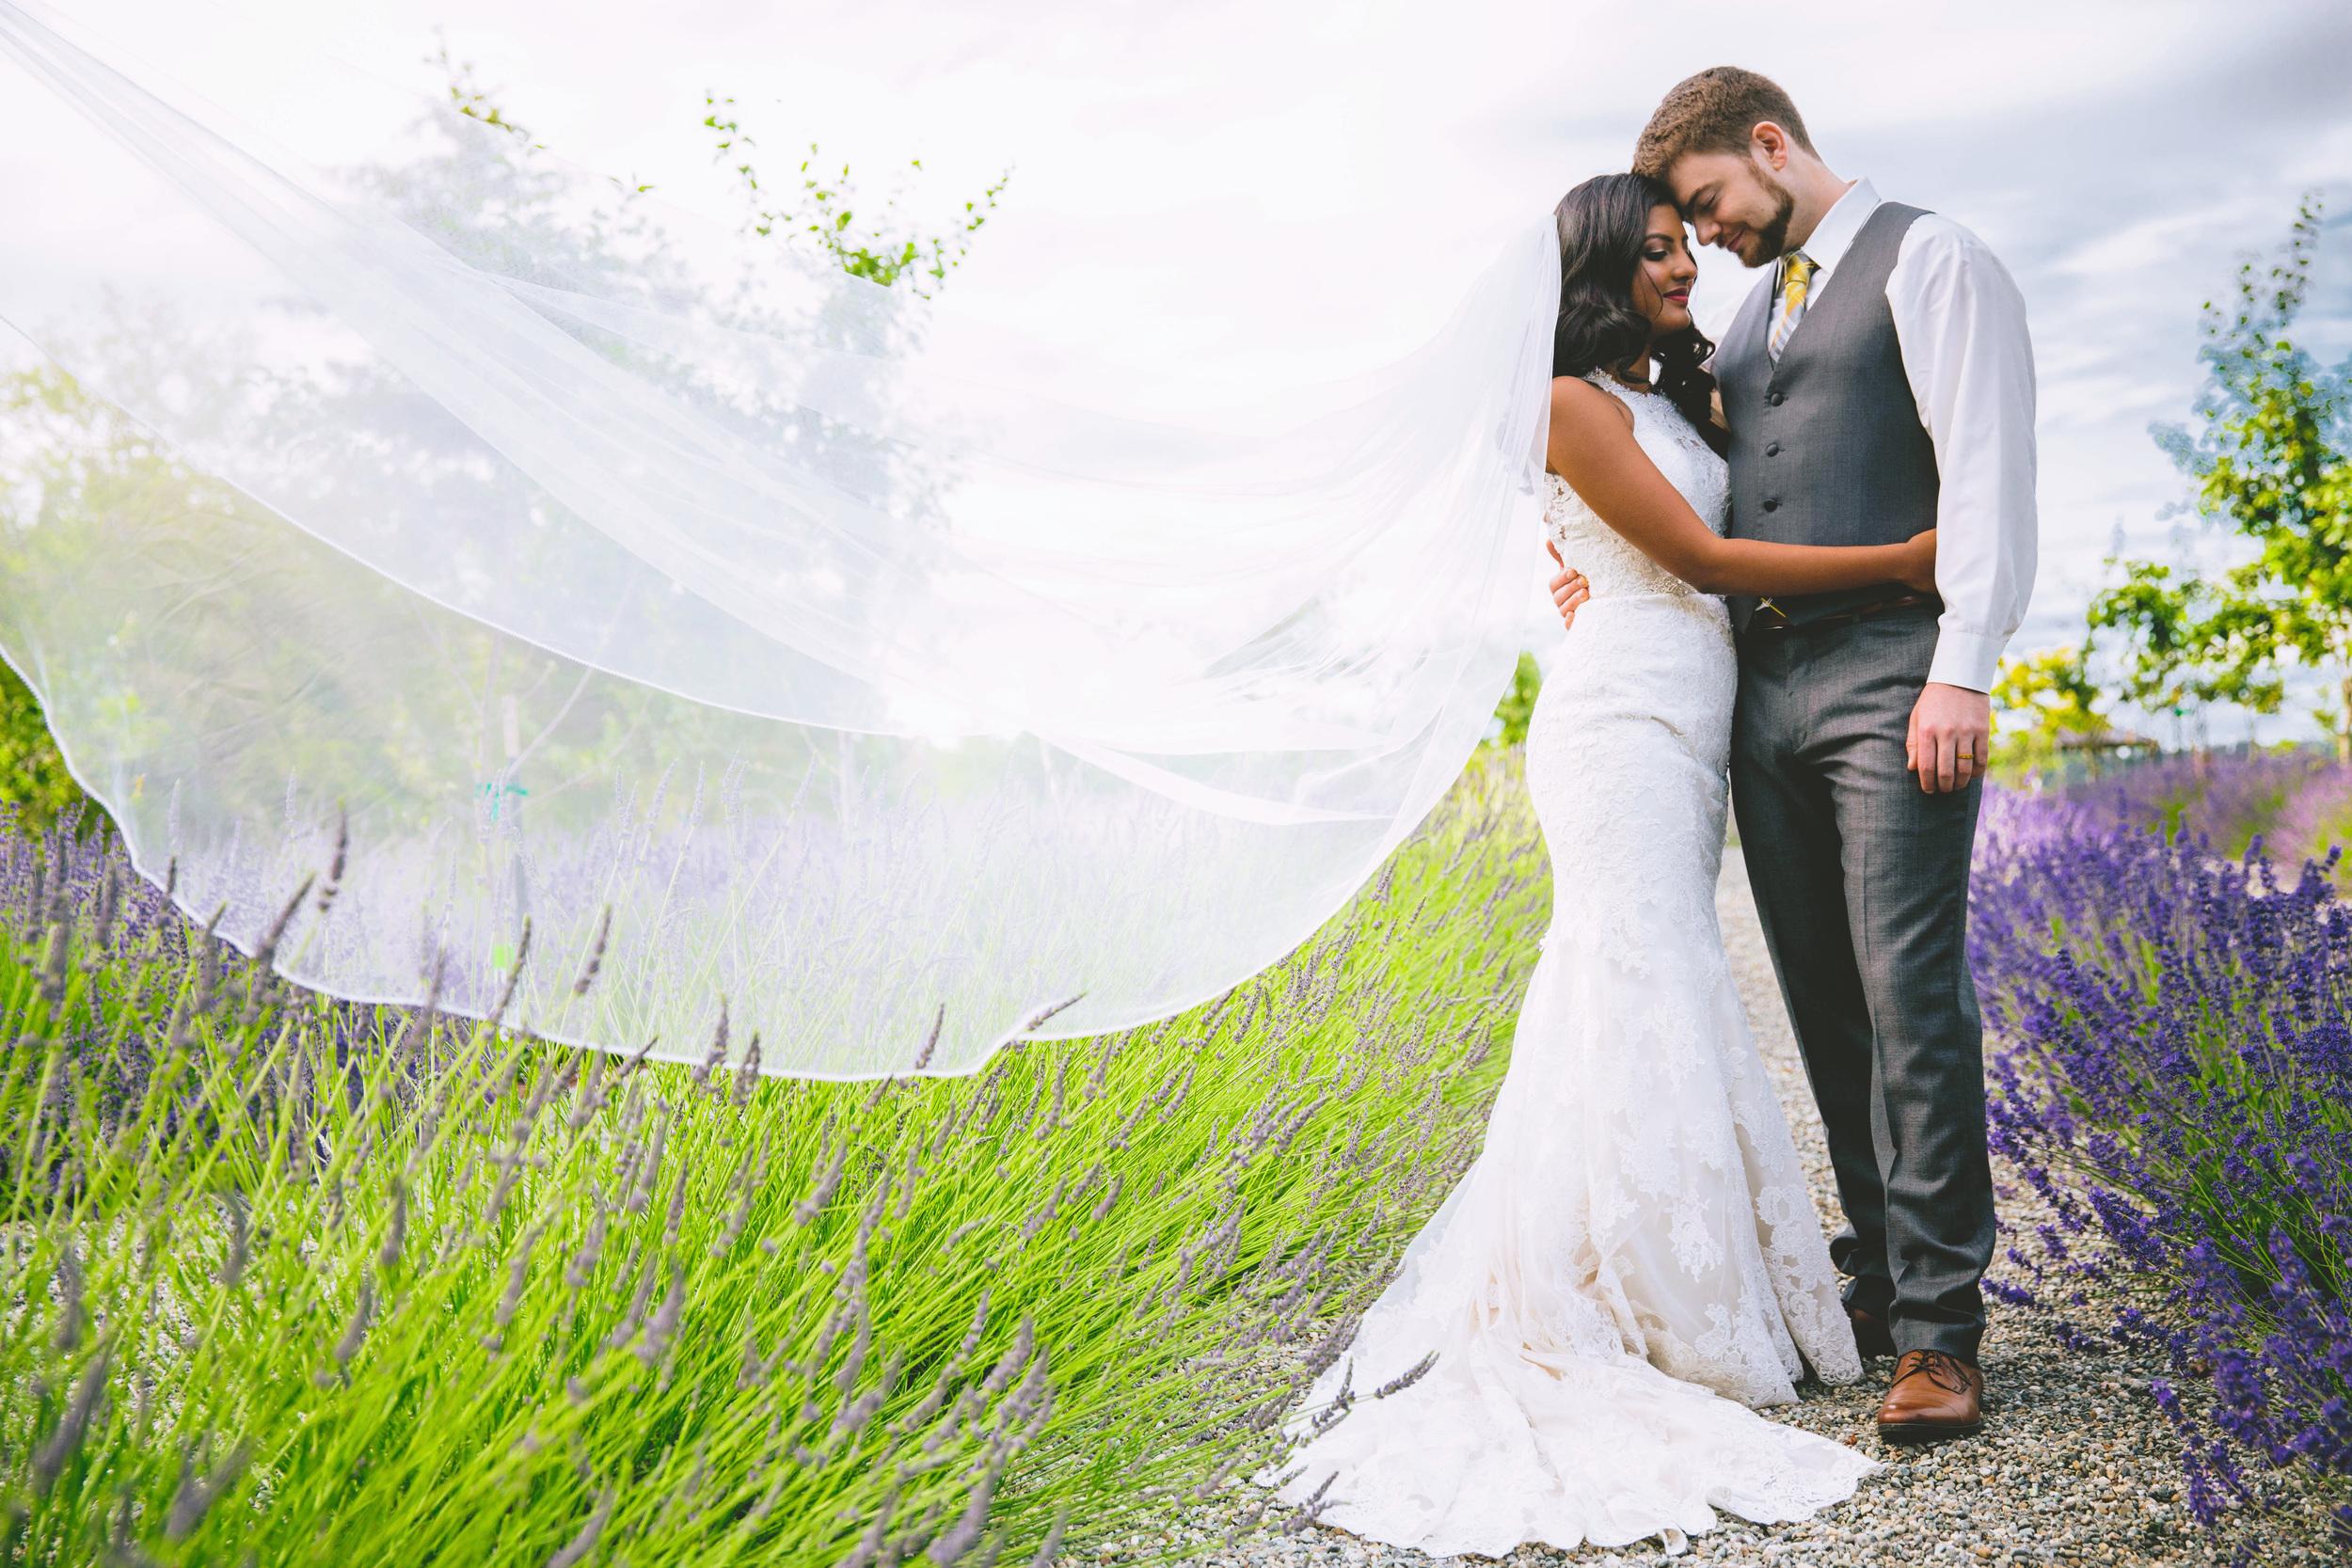 Hima+Dan_Wedding_Seattle+Couple_Kingston_6112016_70.jpg